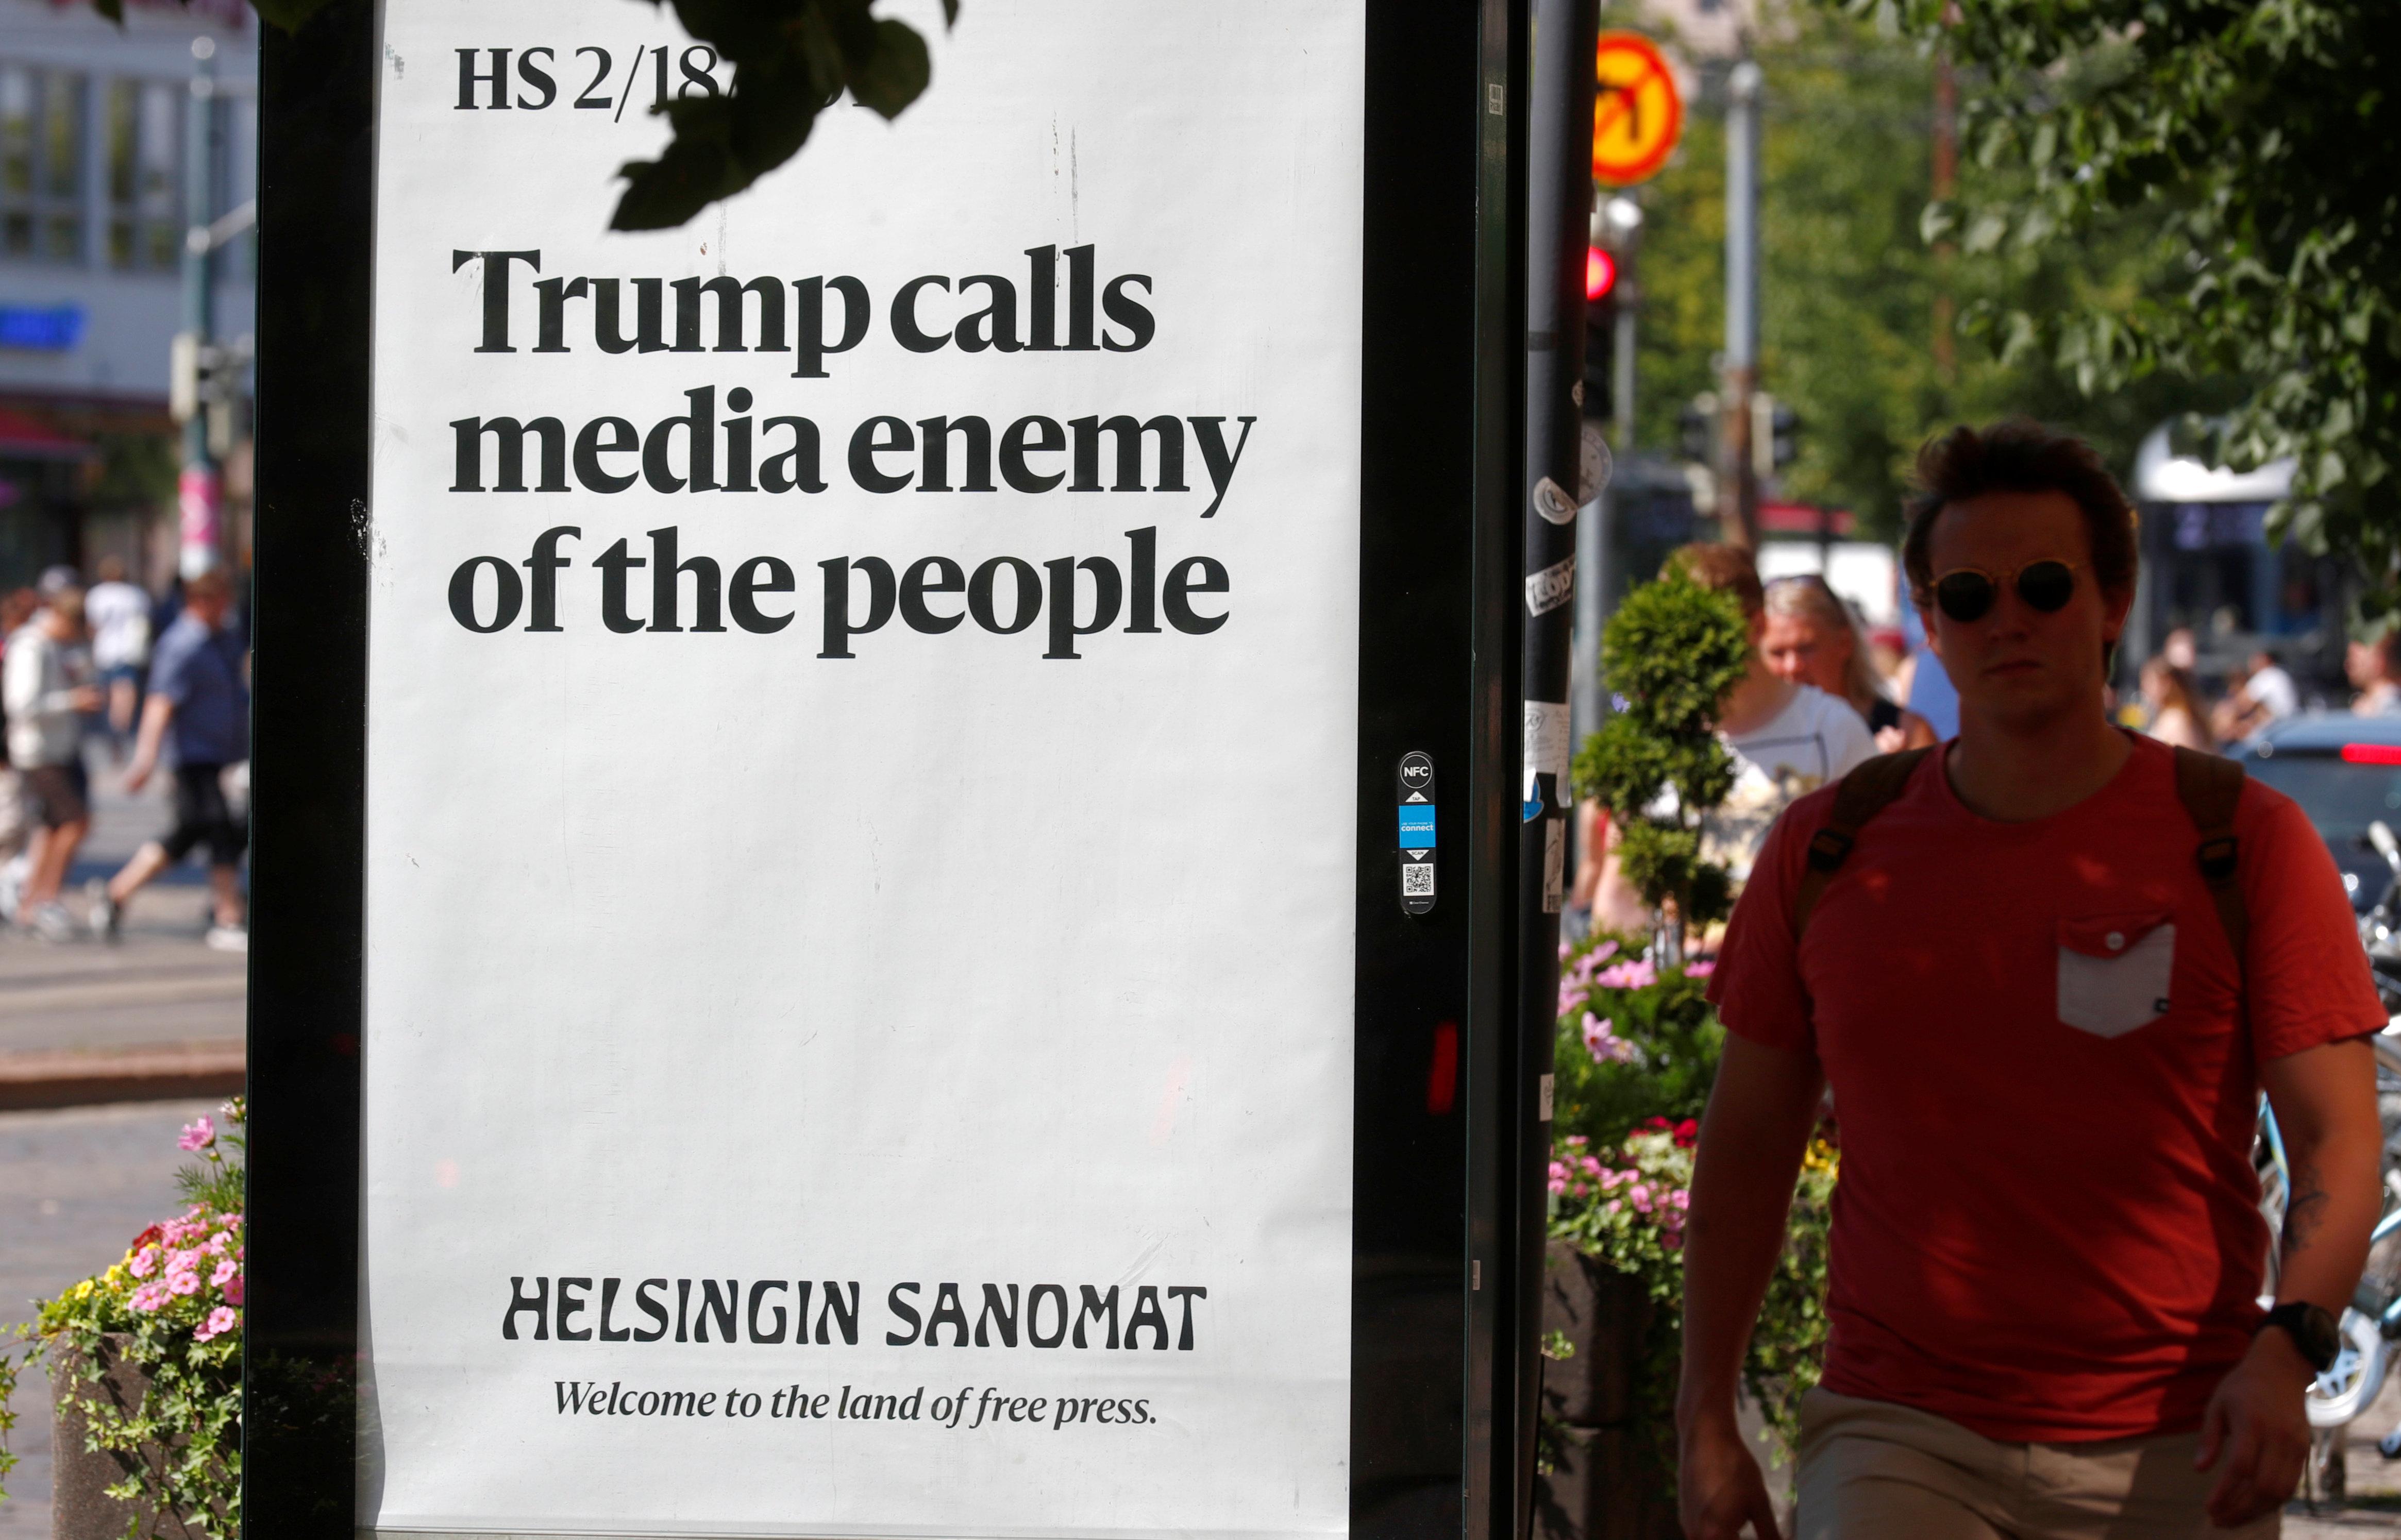 An advert by the Finnish newspaper Helsingin Sanomat is displayed during the U.S. President Donald Trump and Russian President Vladimir Putin summit in Helsinki, Finland July 16, 2018. REUTERS/Ints Kalnins